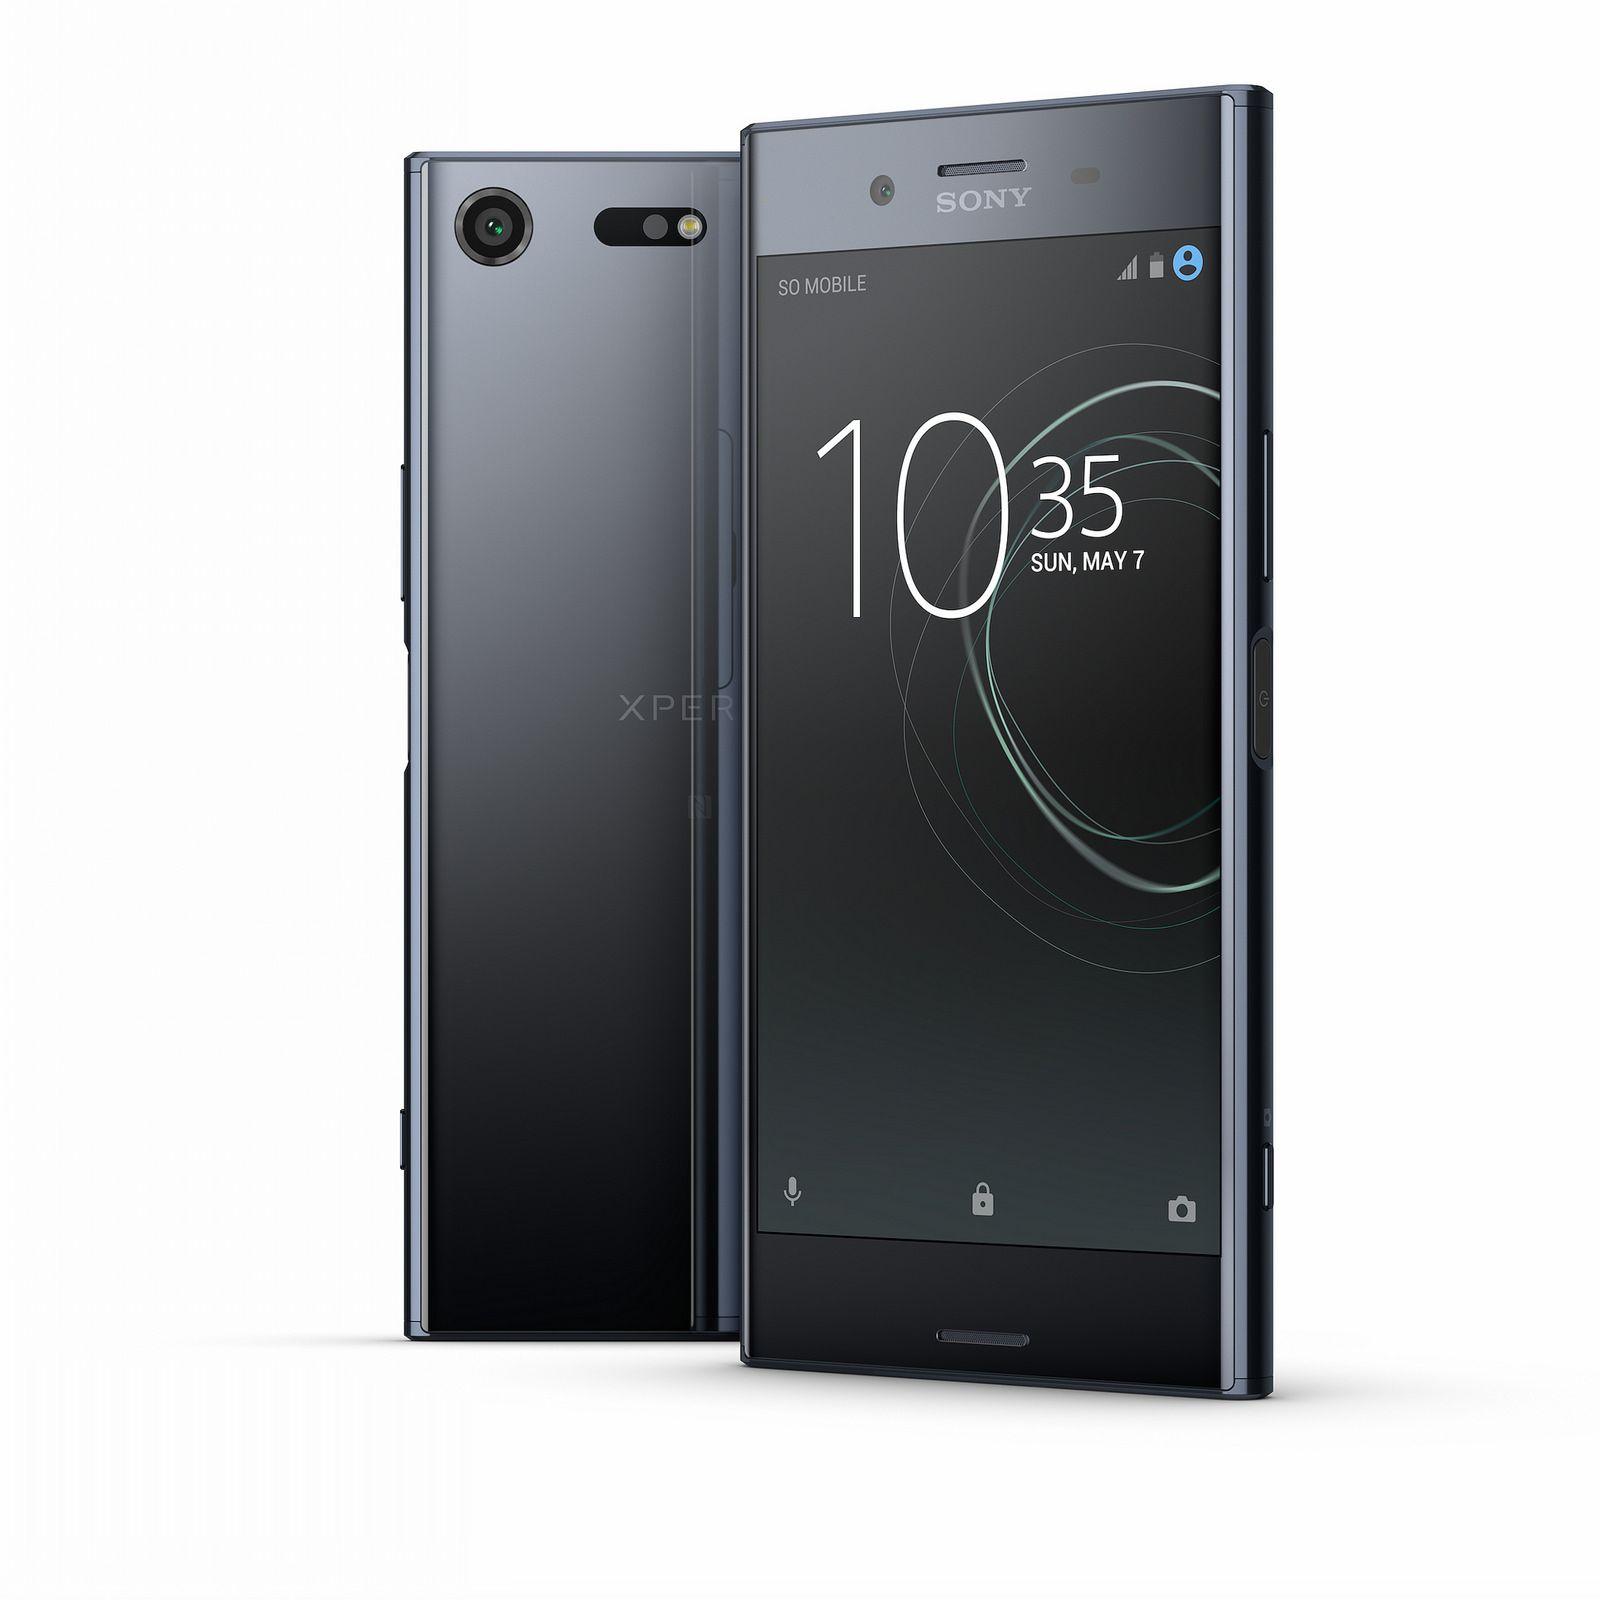 Sony unveils Xperia XZ Premium with 4K display, Snapdragon